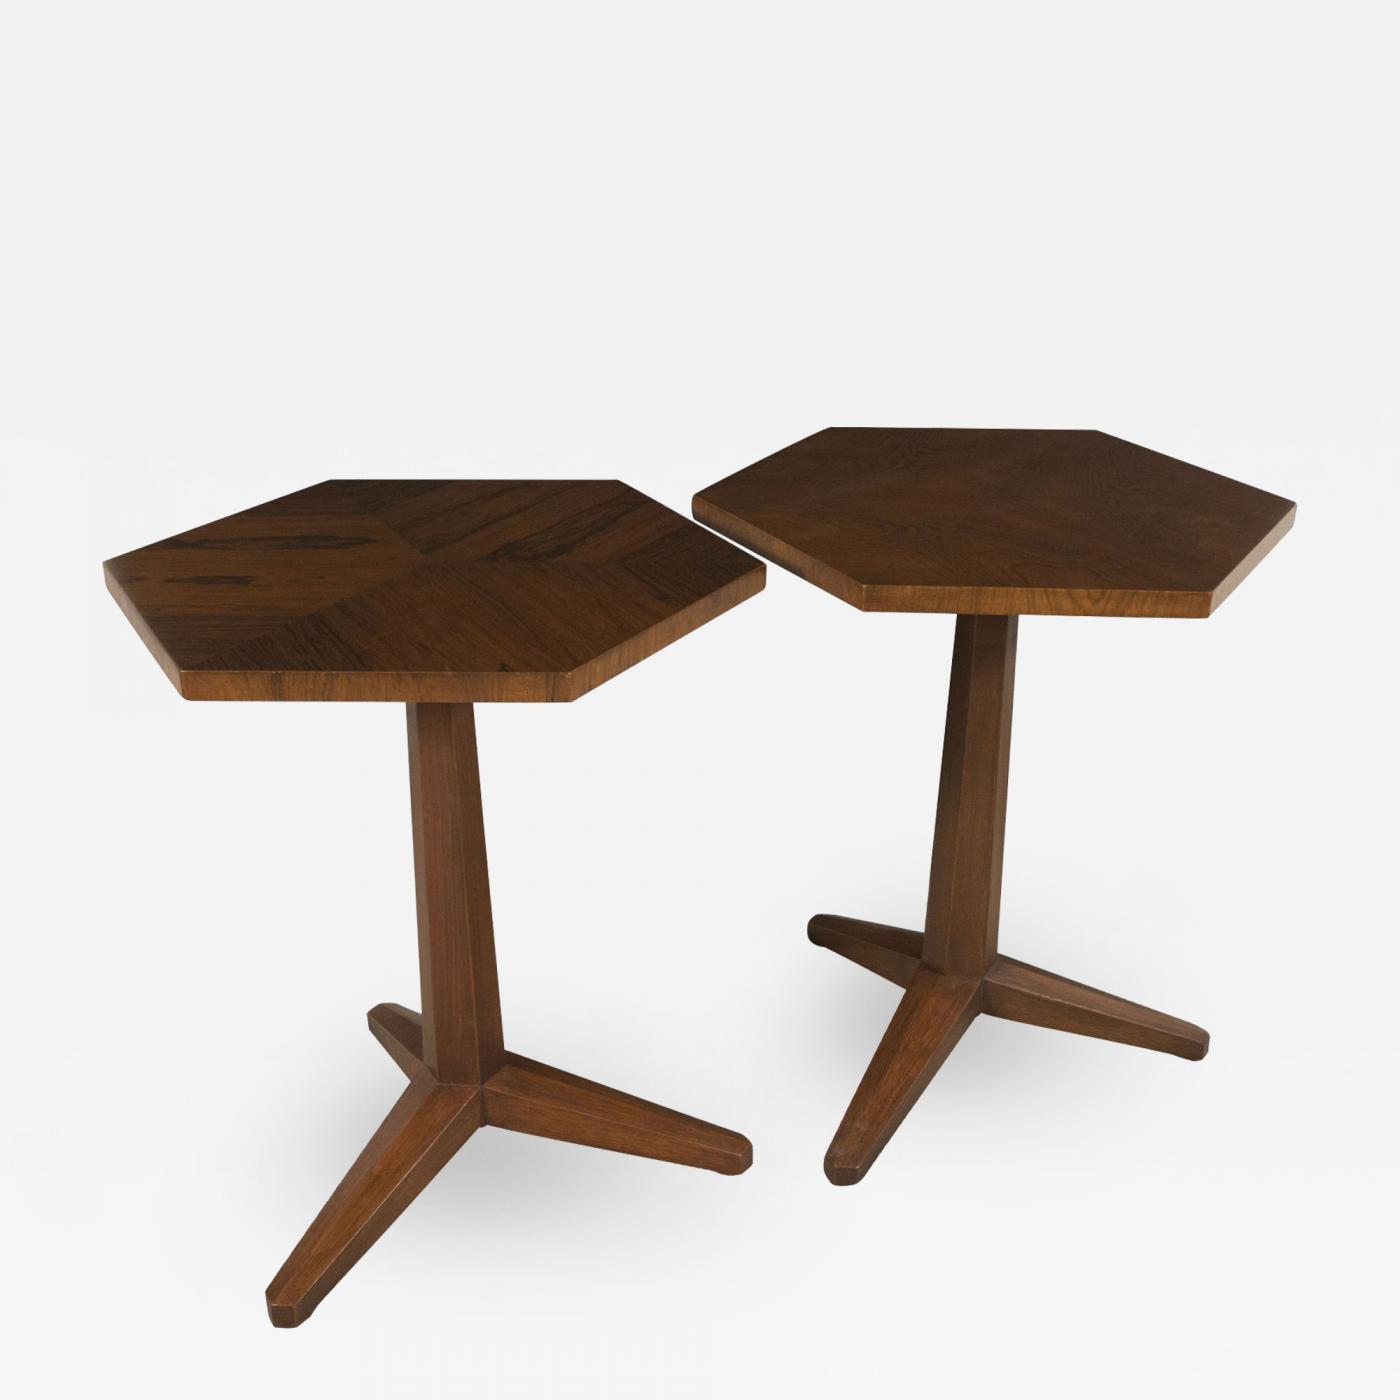 Drexel Heritage Dining Room Furniture Heritage Pedestal Table Newlibrarygood Com